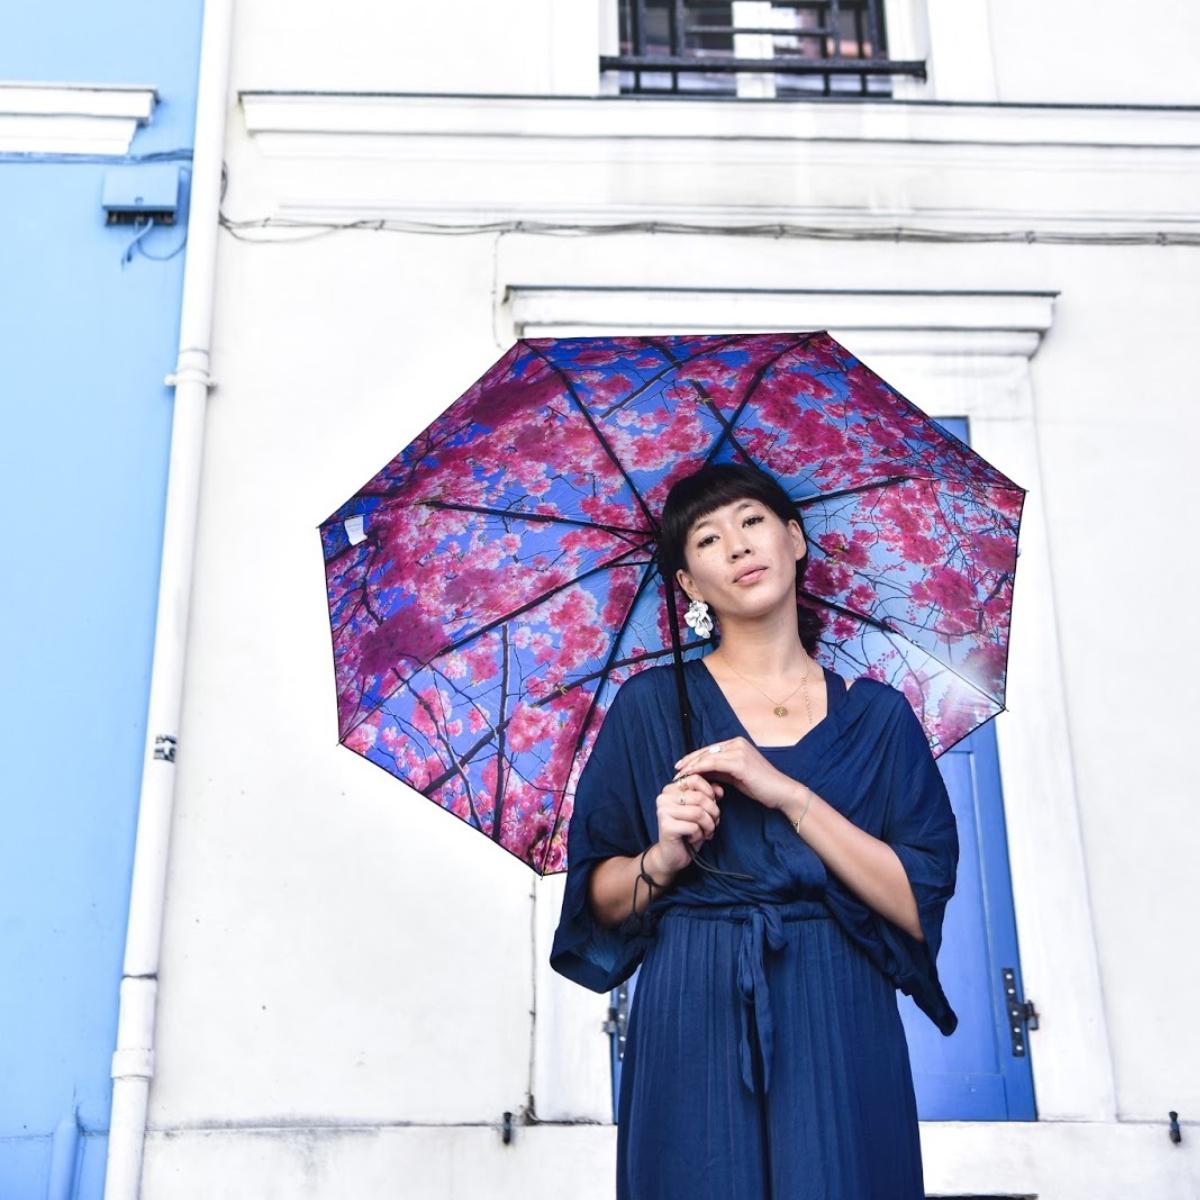 Cherry Regenschirm von HappySweeds (1)